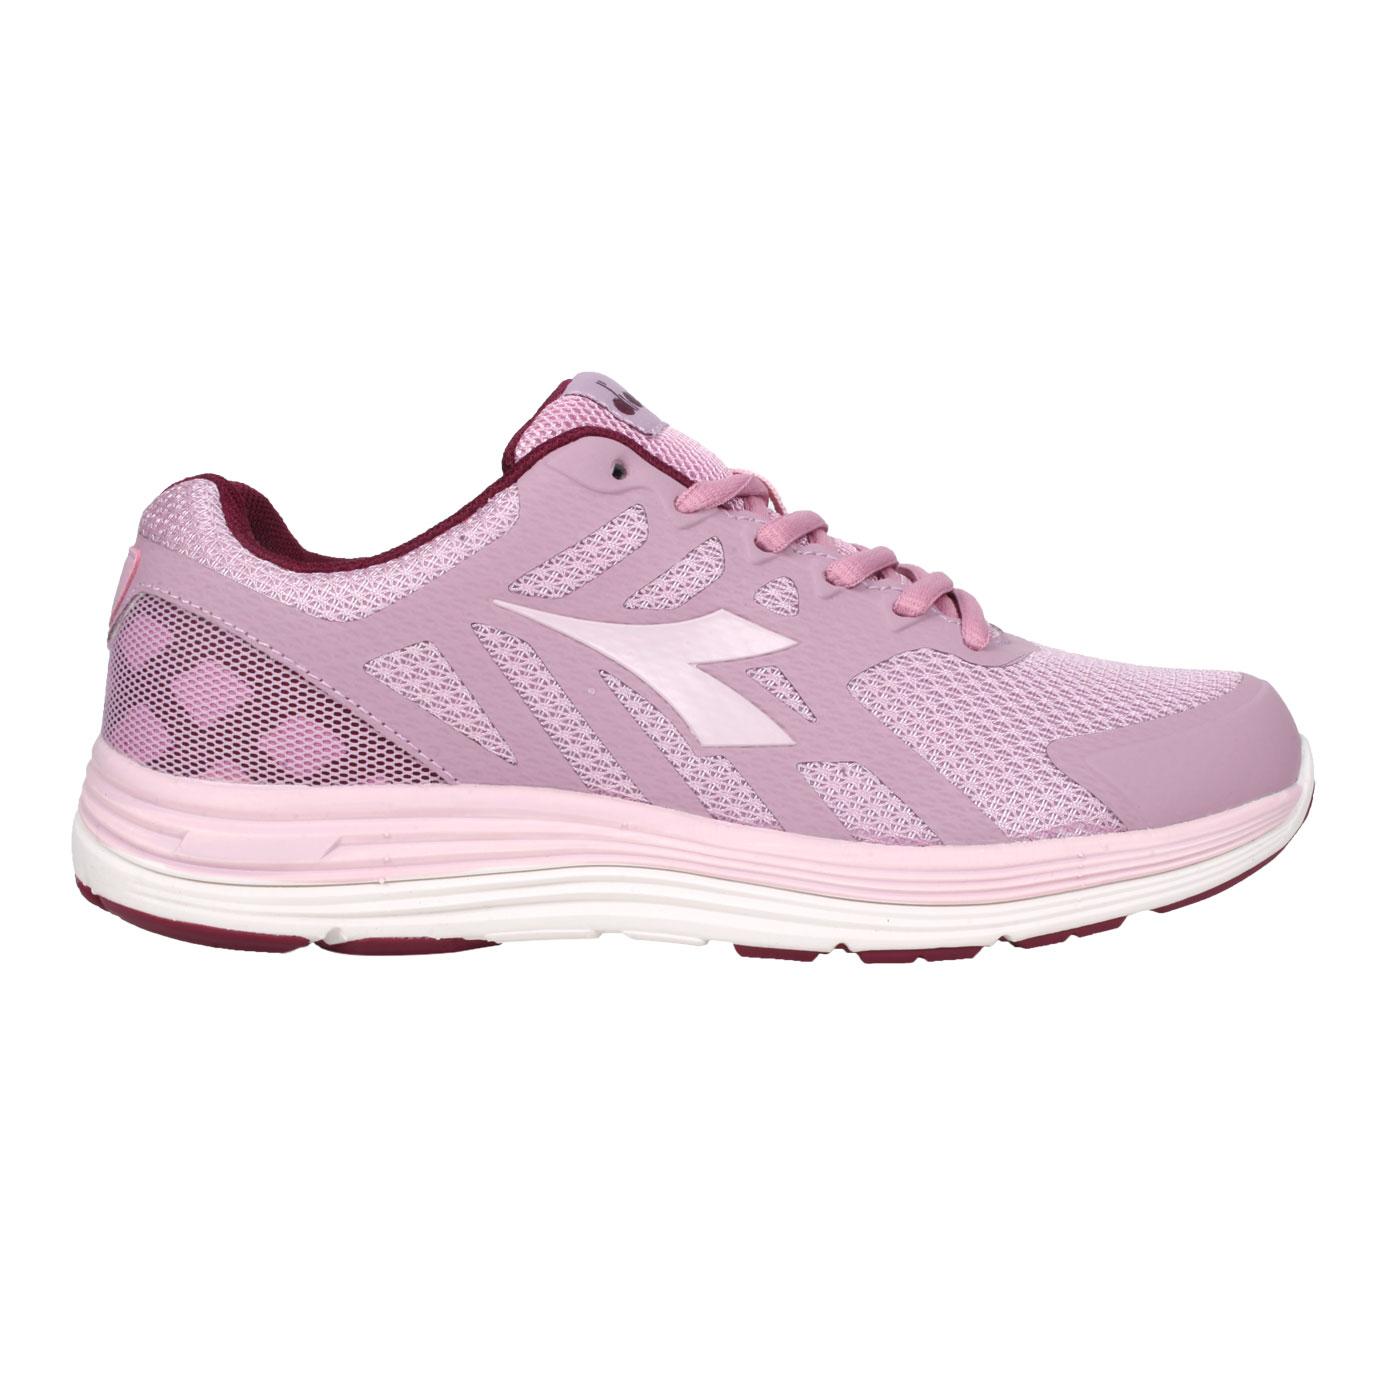 DIADORA 女款專業輕量慢跑鞋 DA31635 - 芋紫